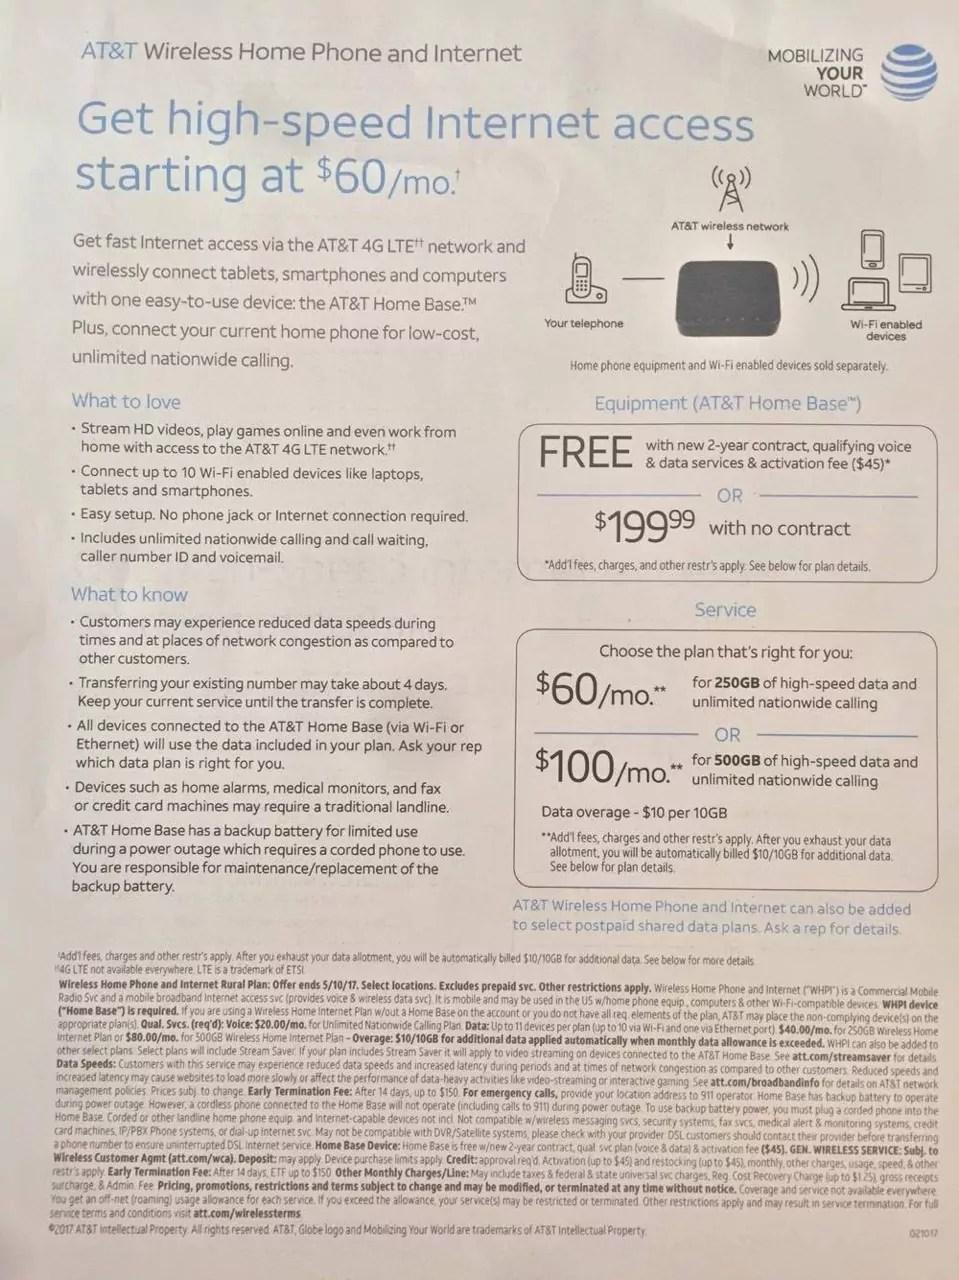 ATT Rural Plan?ssl=1 at&t's wireless home phone & internet rural plan 250gb for $60,Verizon Home Phone And Internet Plans